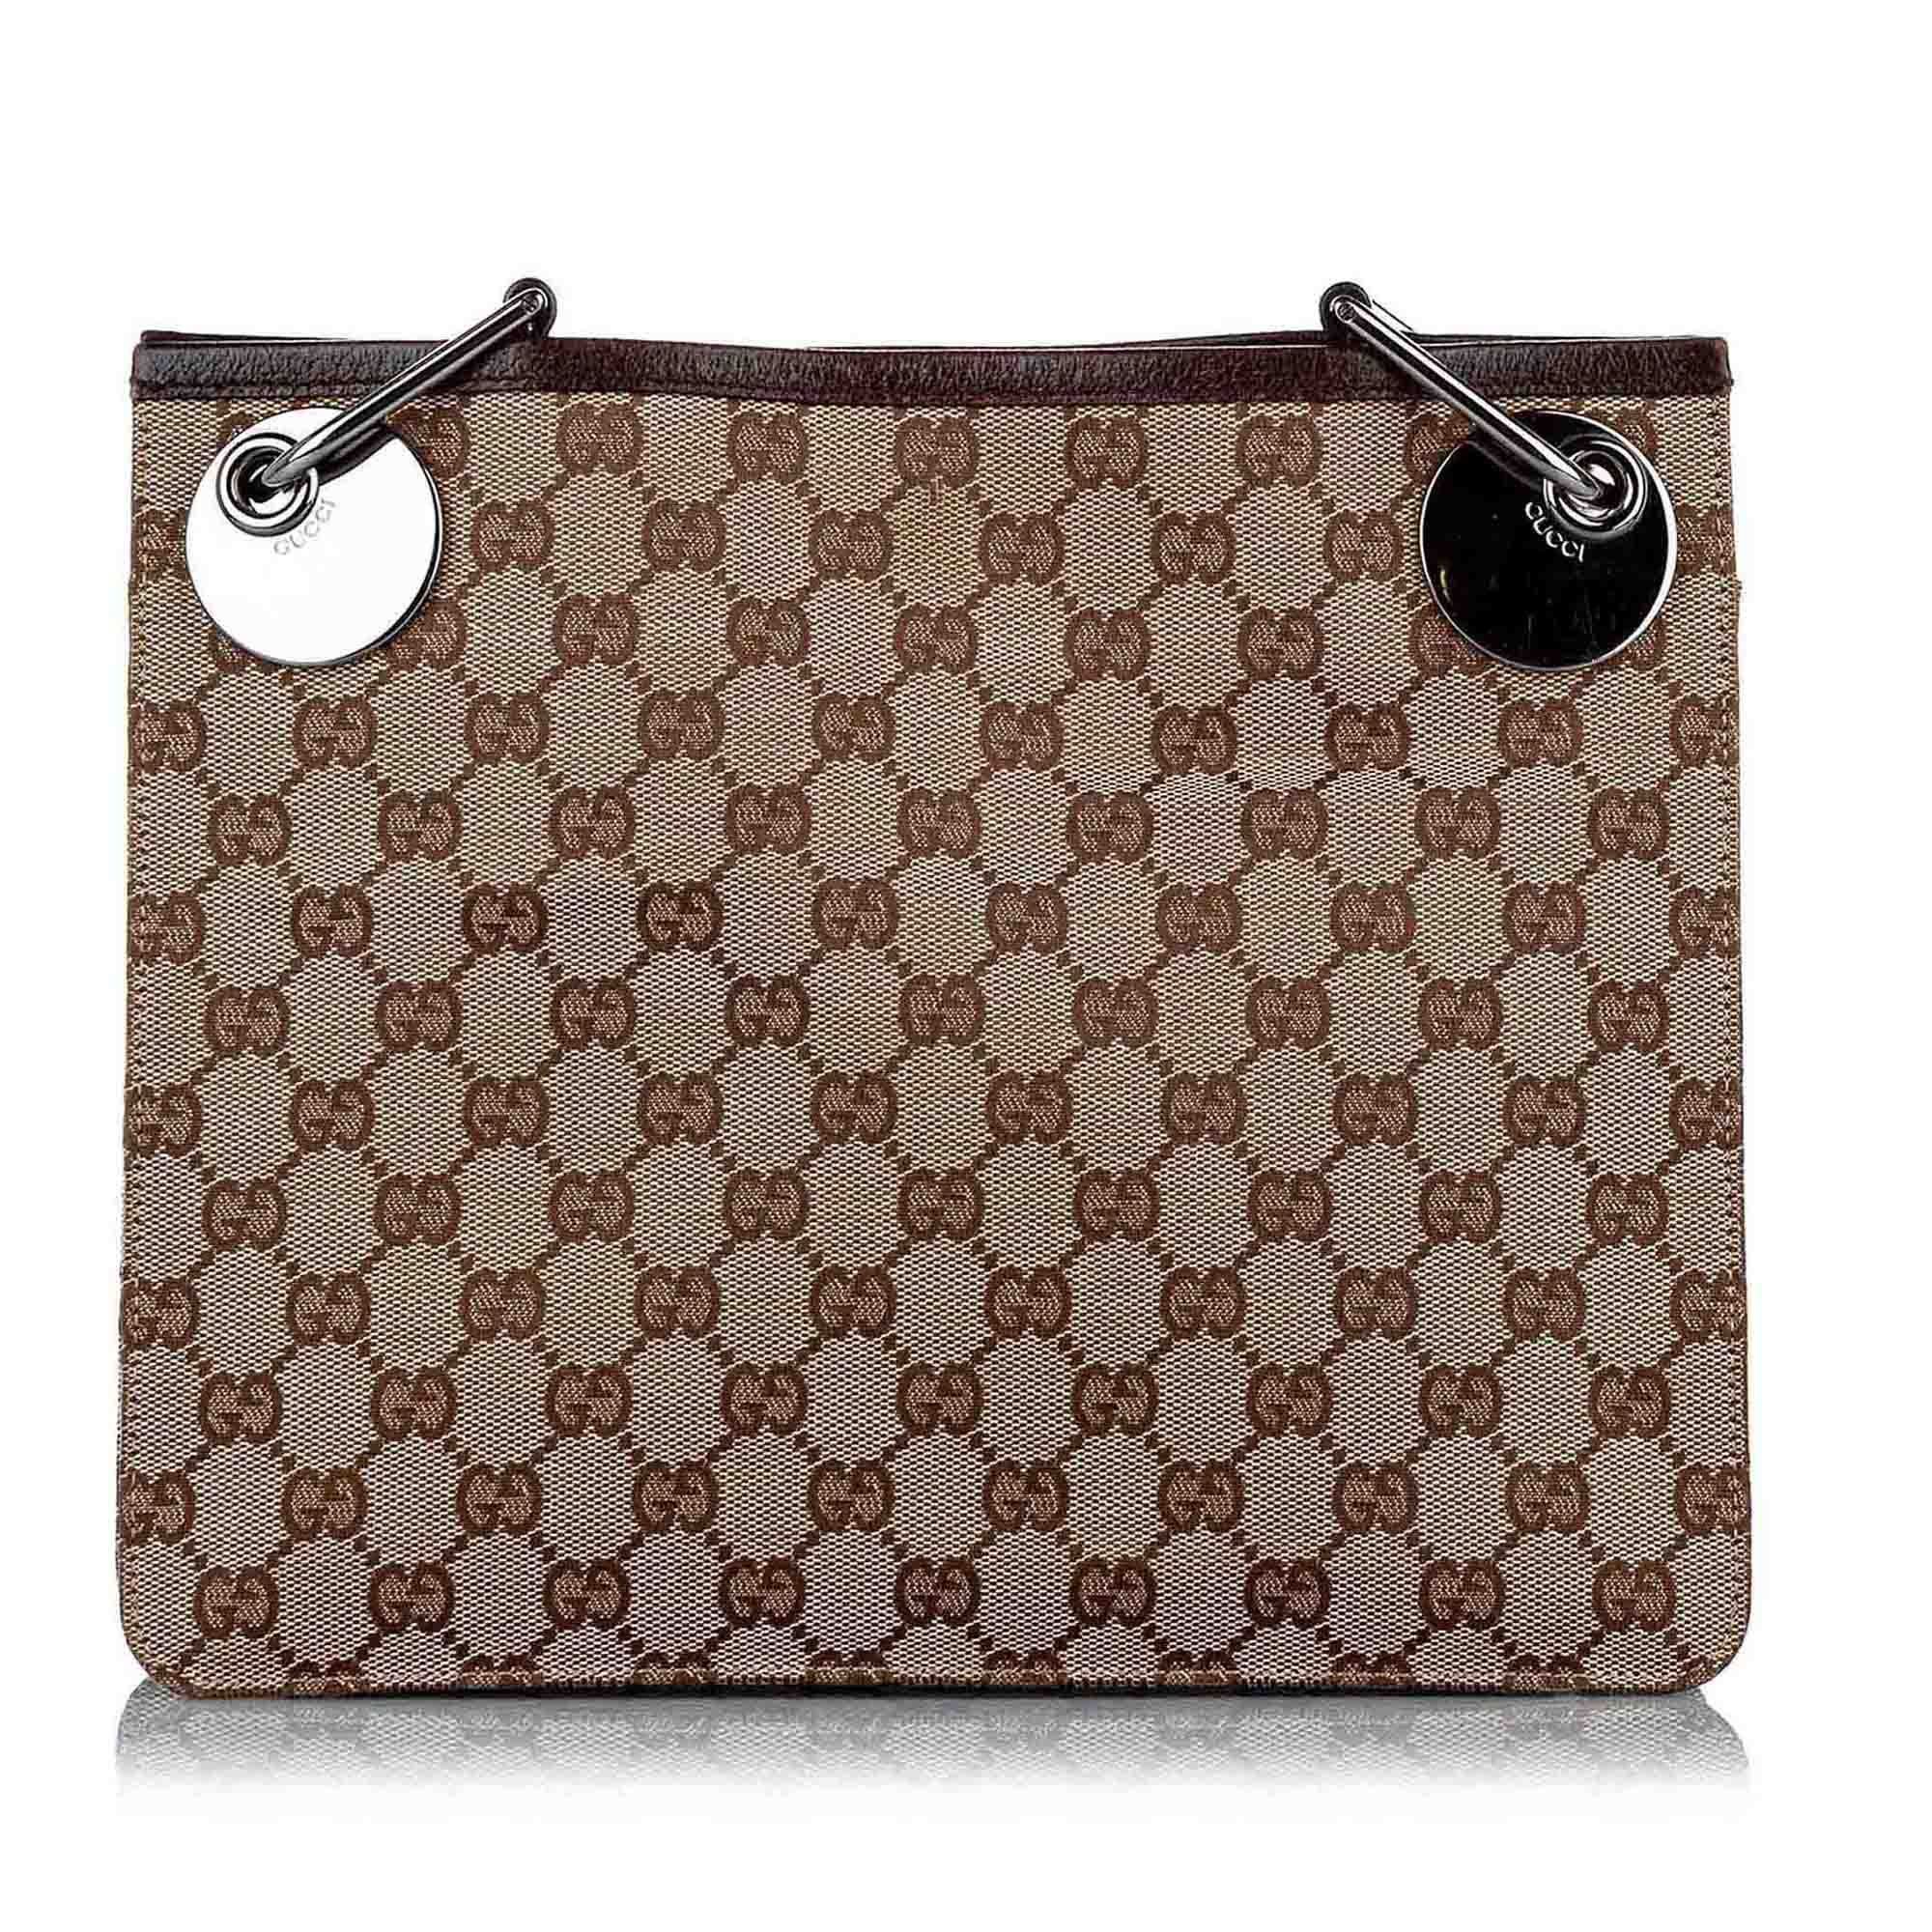 Vintage Gucci GG Canvas Eclipse Crossbody Bag Brown